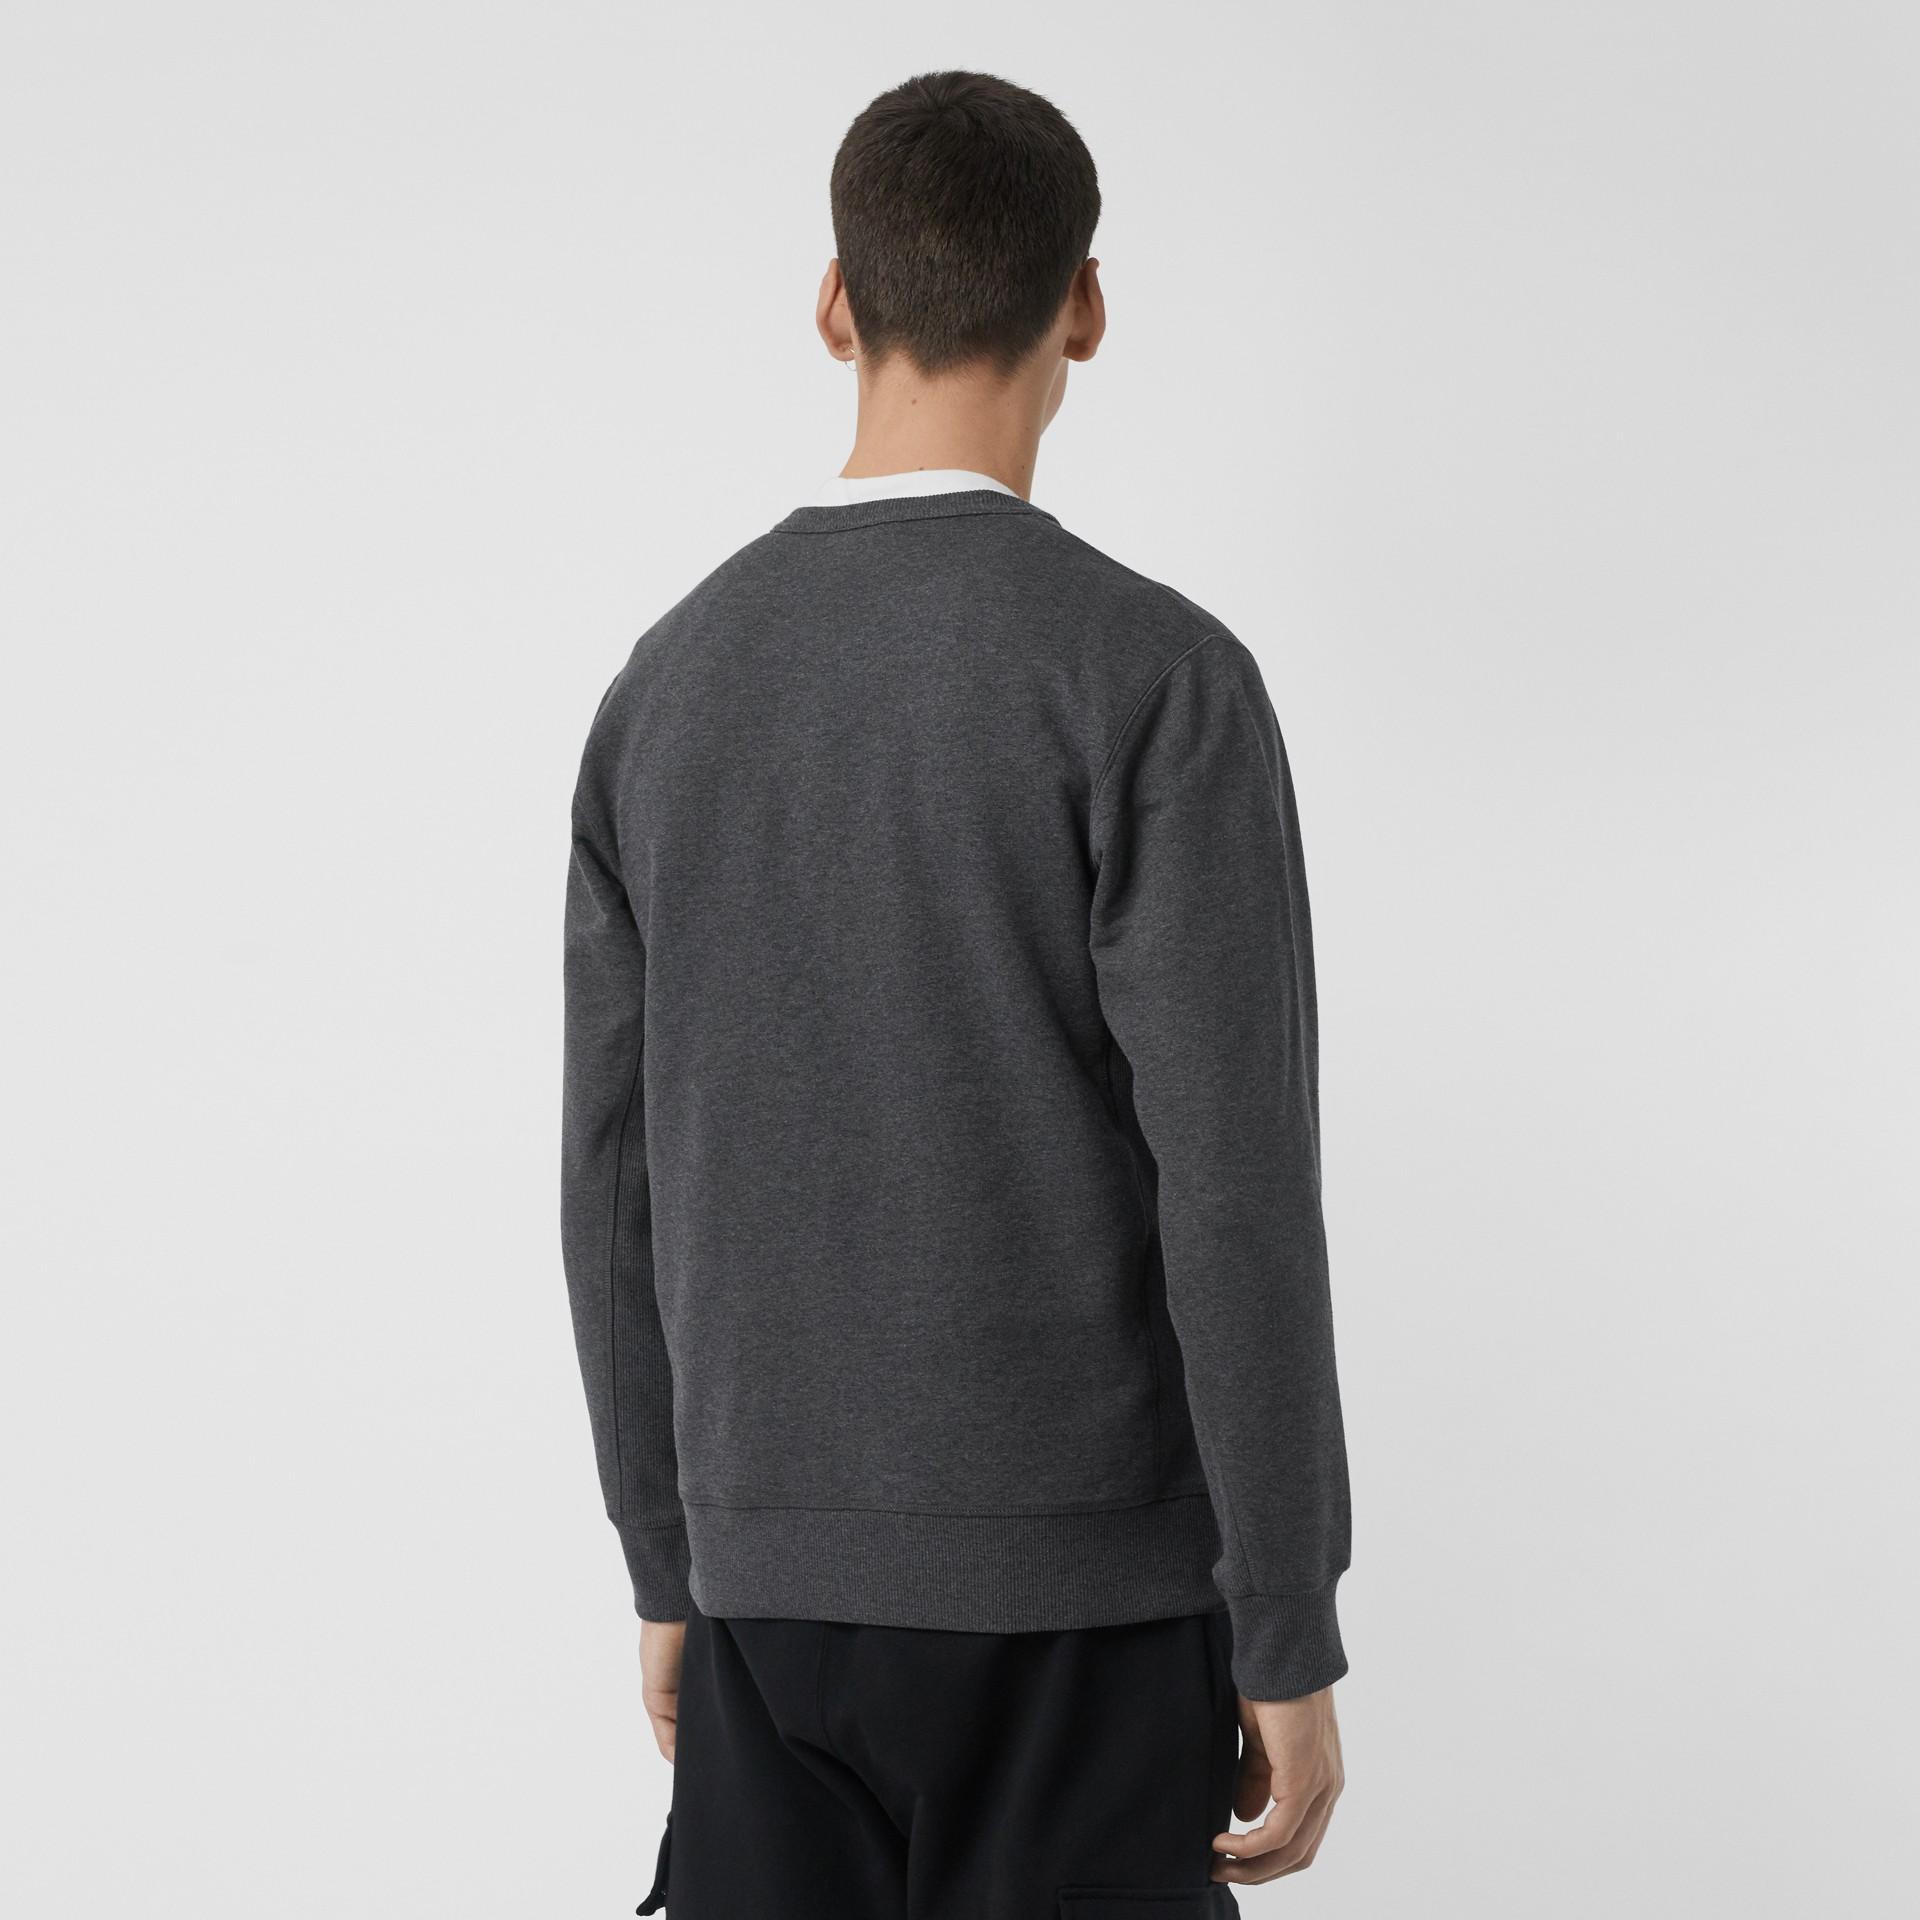 Embroidered Crest Cotton Sweatshirt in Mid Grey Melange - Men | Burberry United Kingdom - gallery image 2